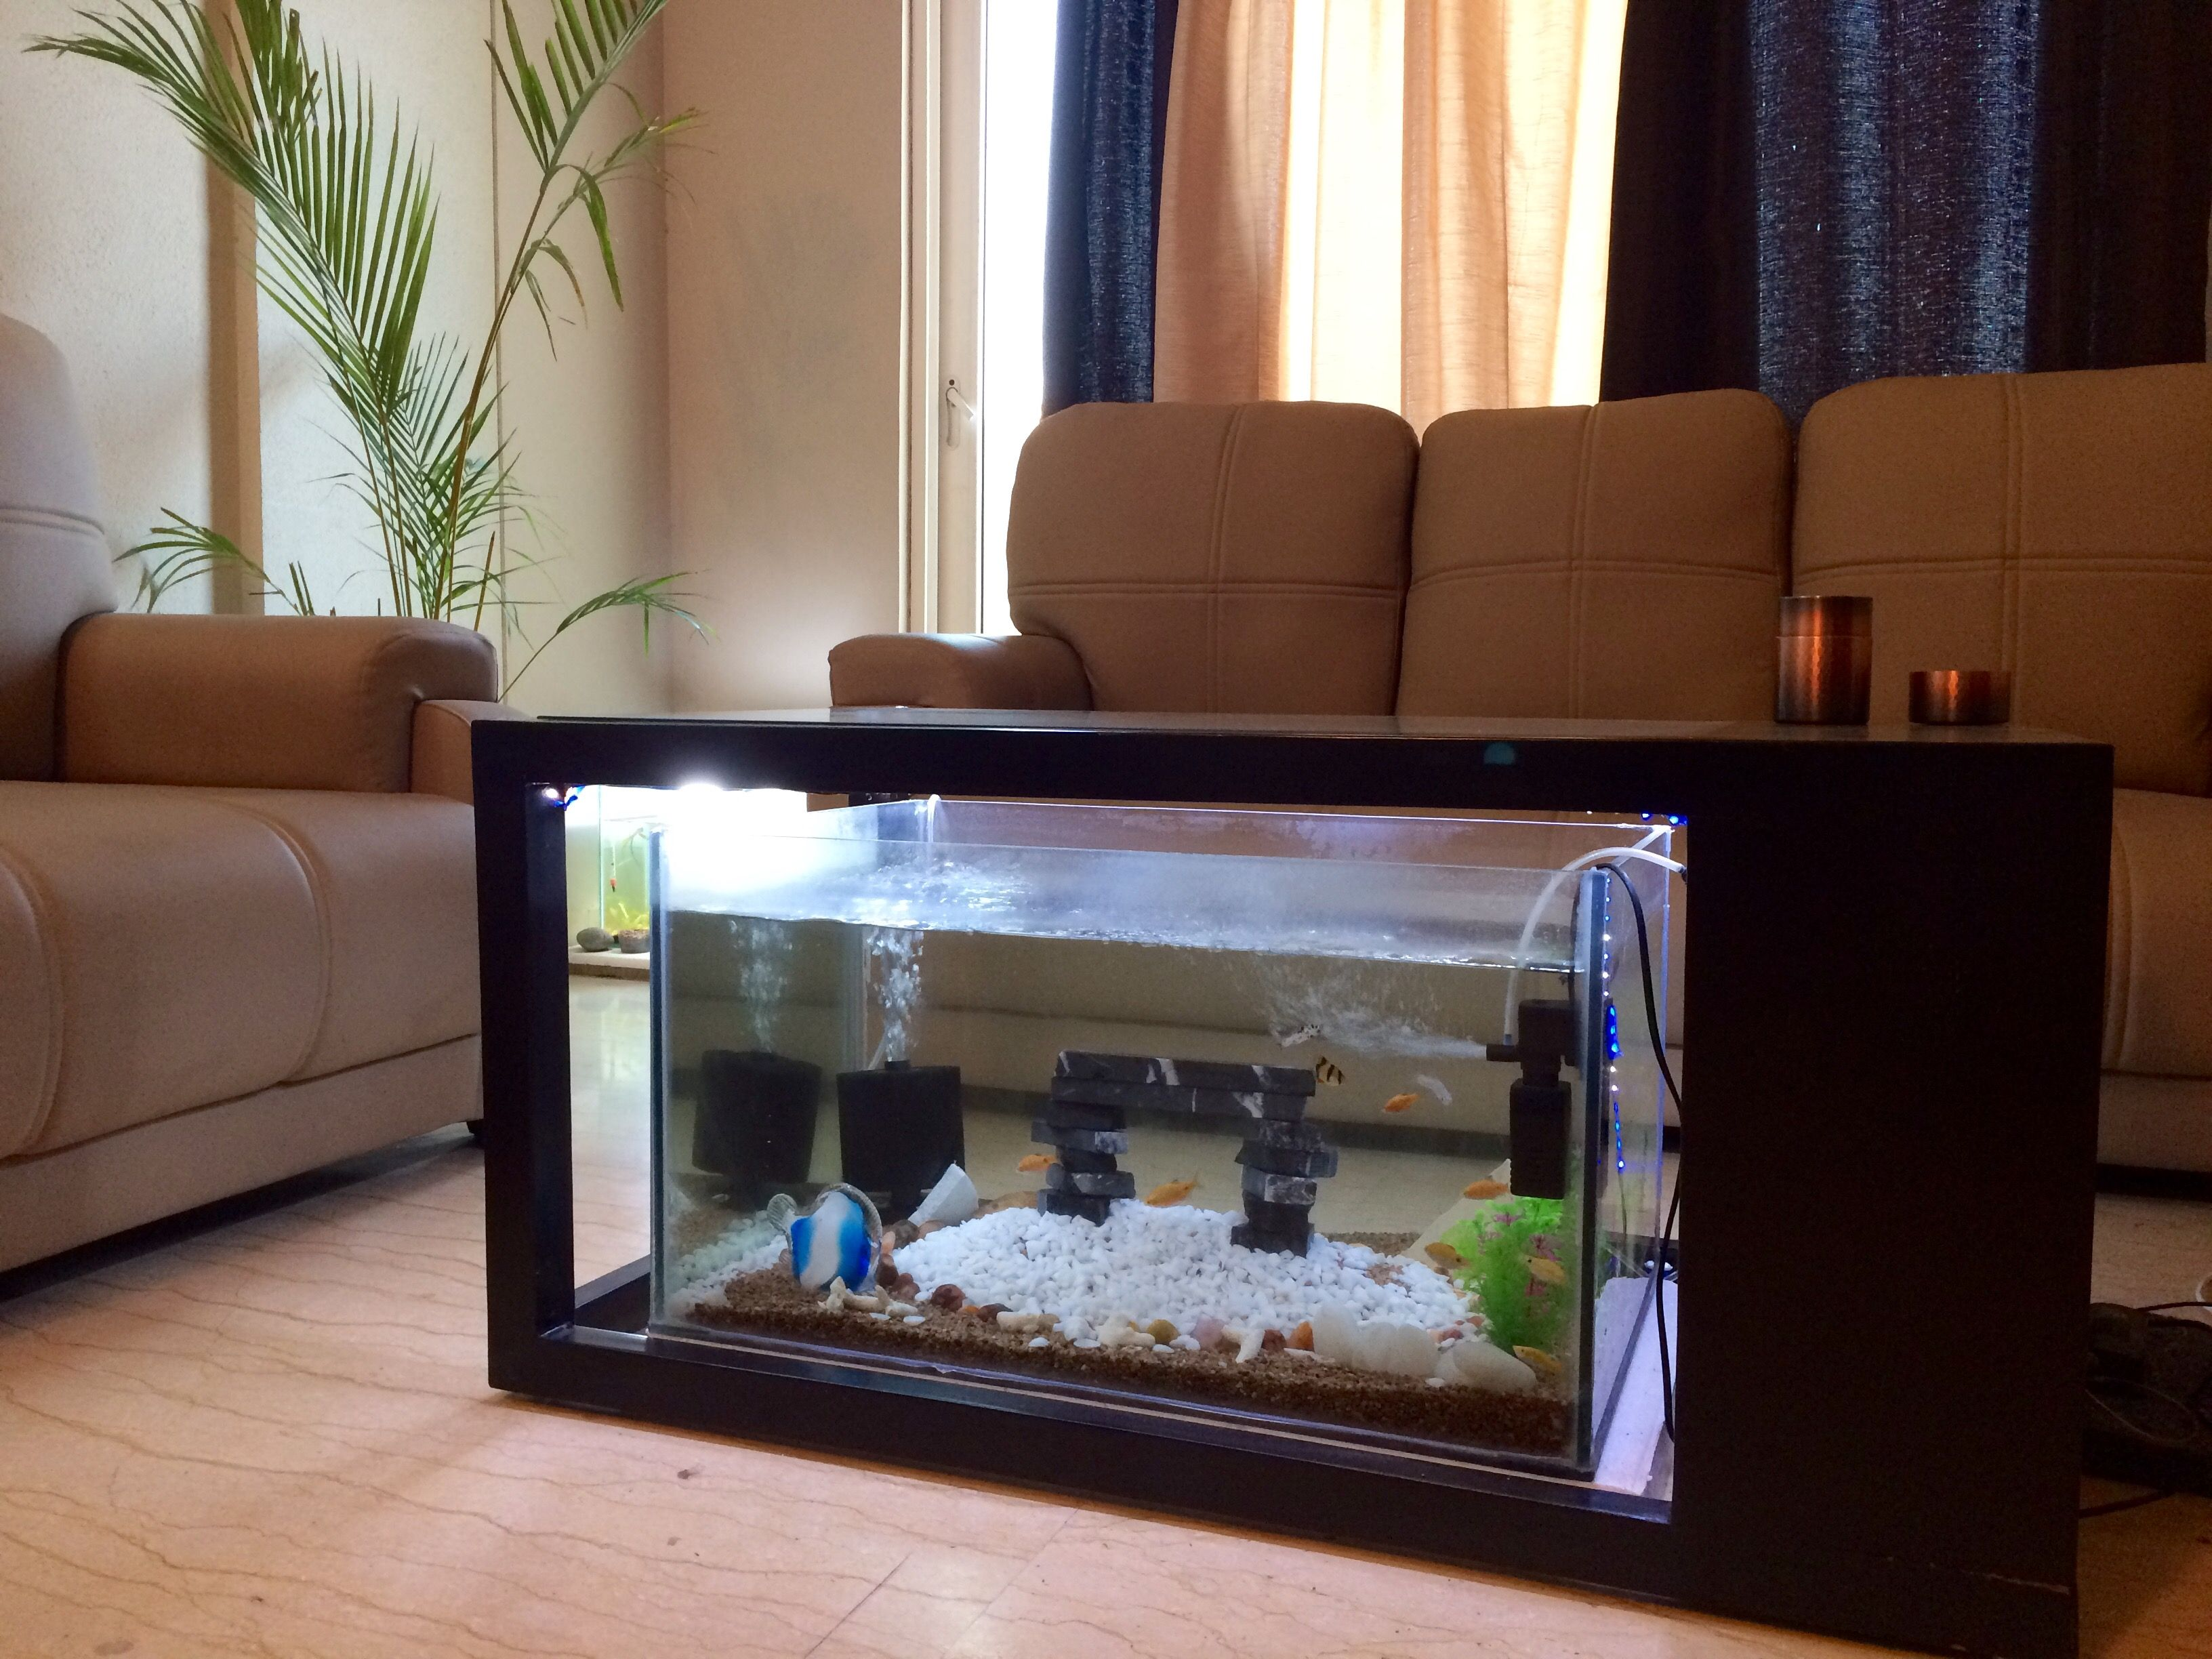 Aquarium center table (With images) | Center table, Decor ...